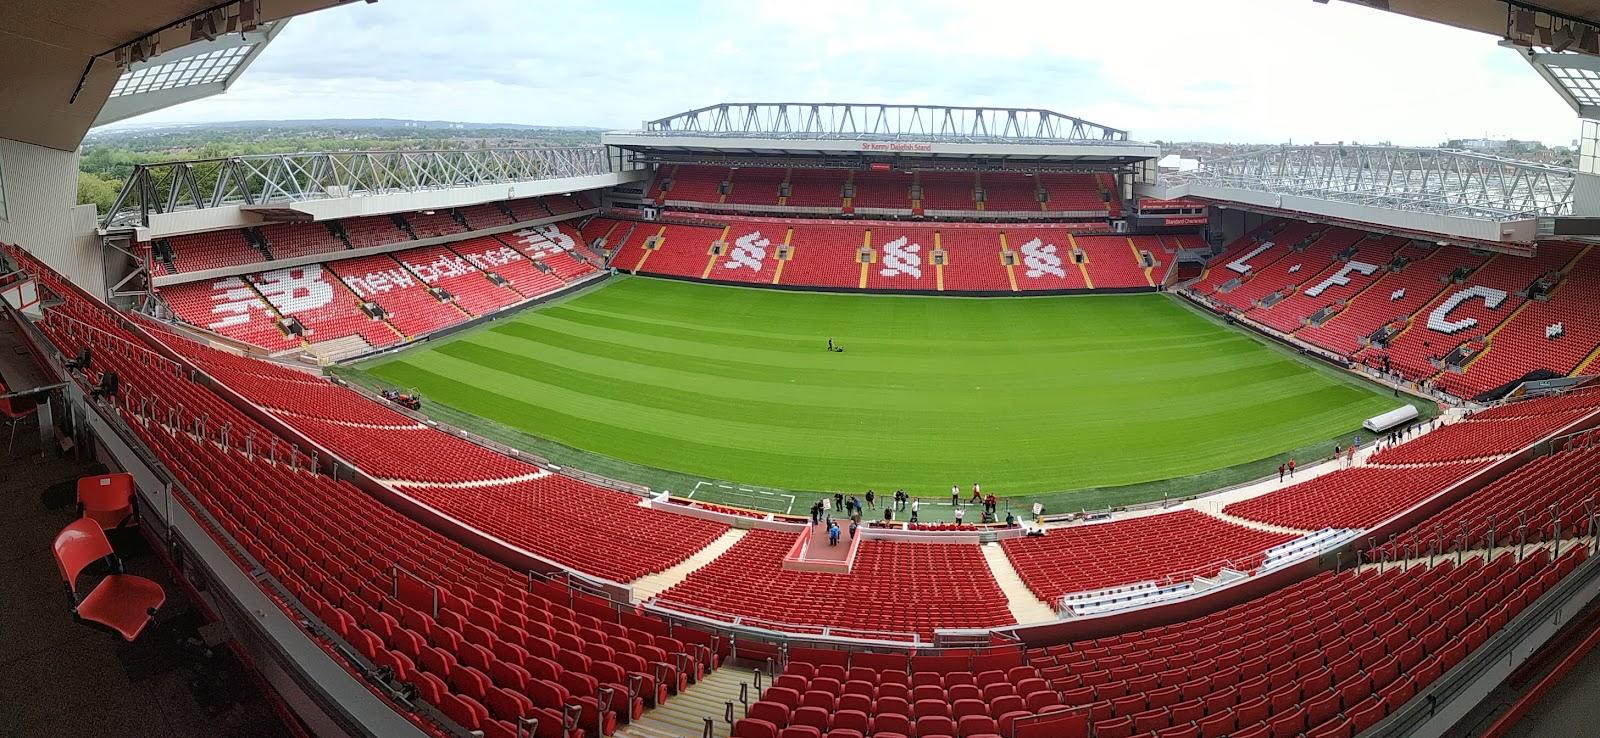 An empty Anfield football stadium